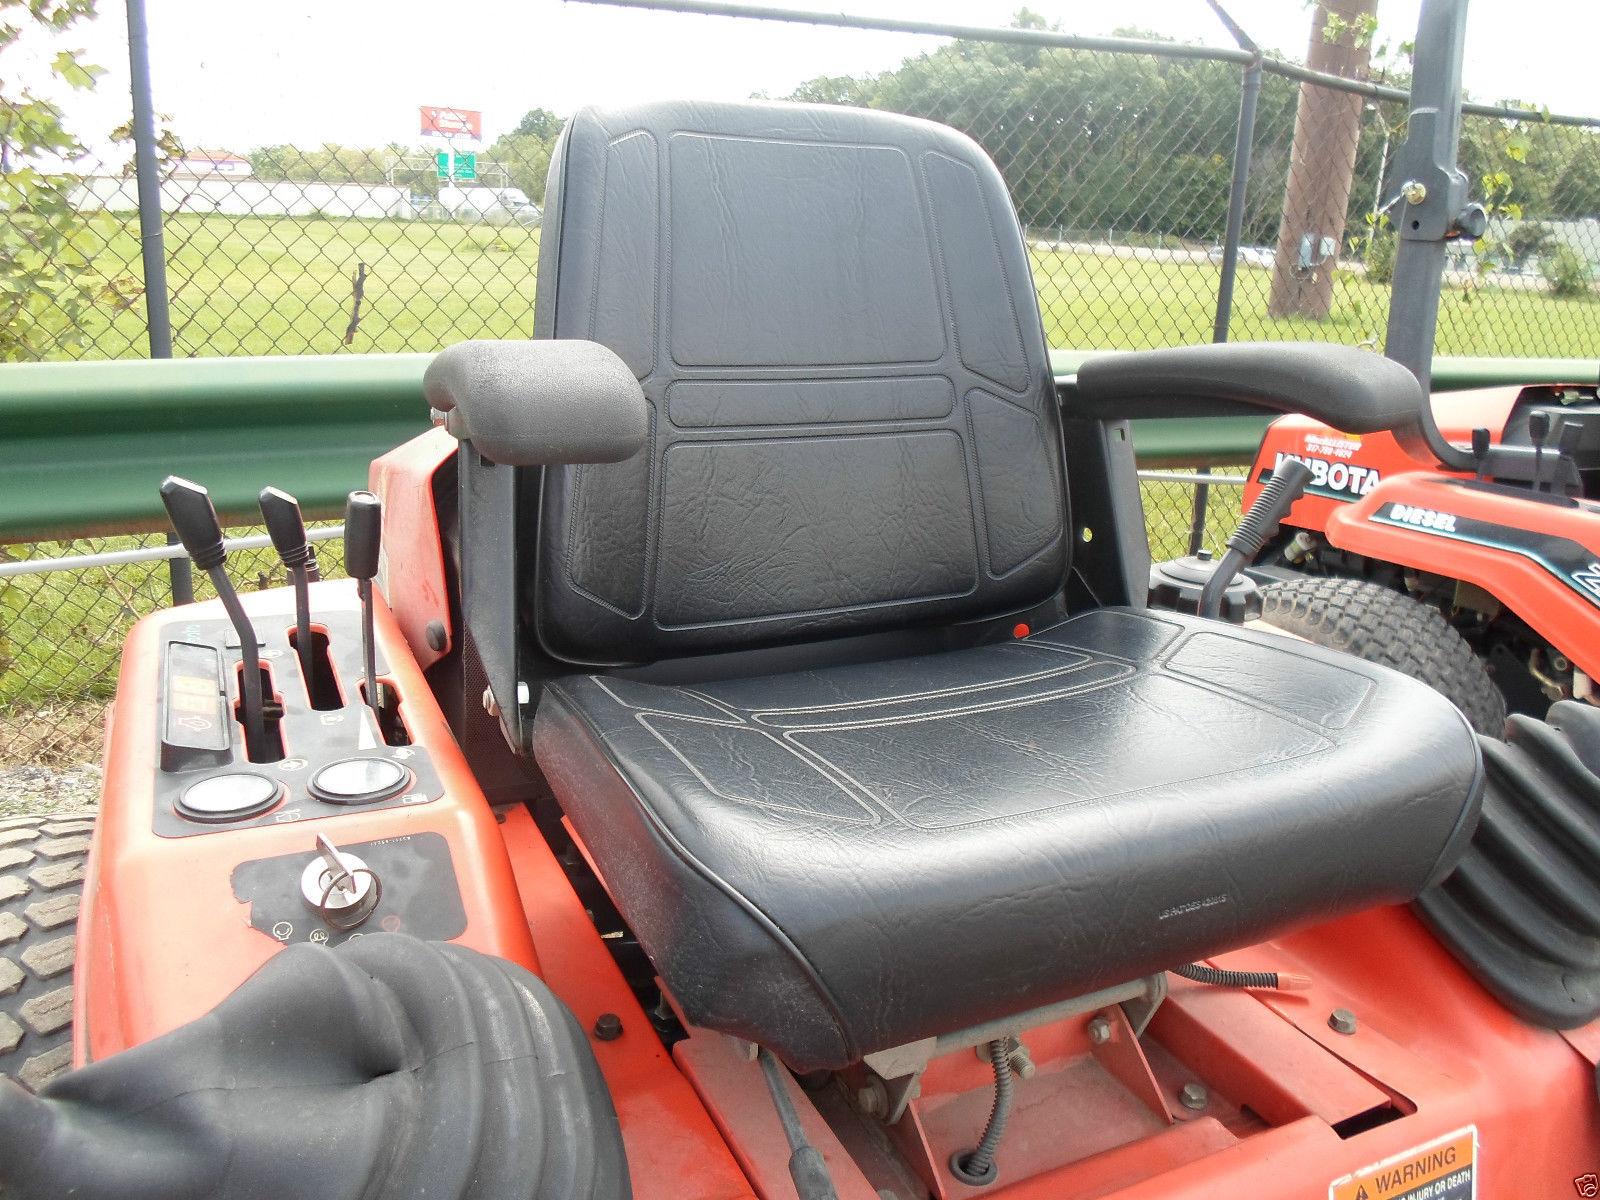 Kubota Zd21 Transmission Parts Diagram Schematic Diagrams Zero Turn Mower Wiring Tractor Seat Trusted U2022 Zd25